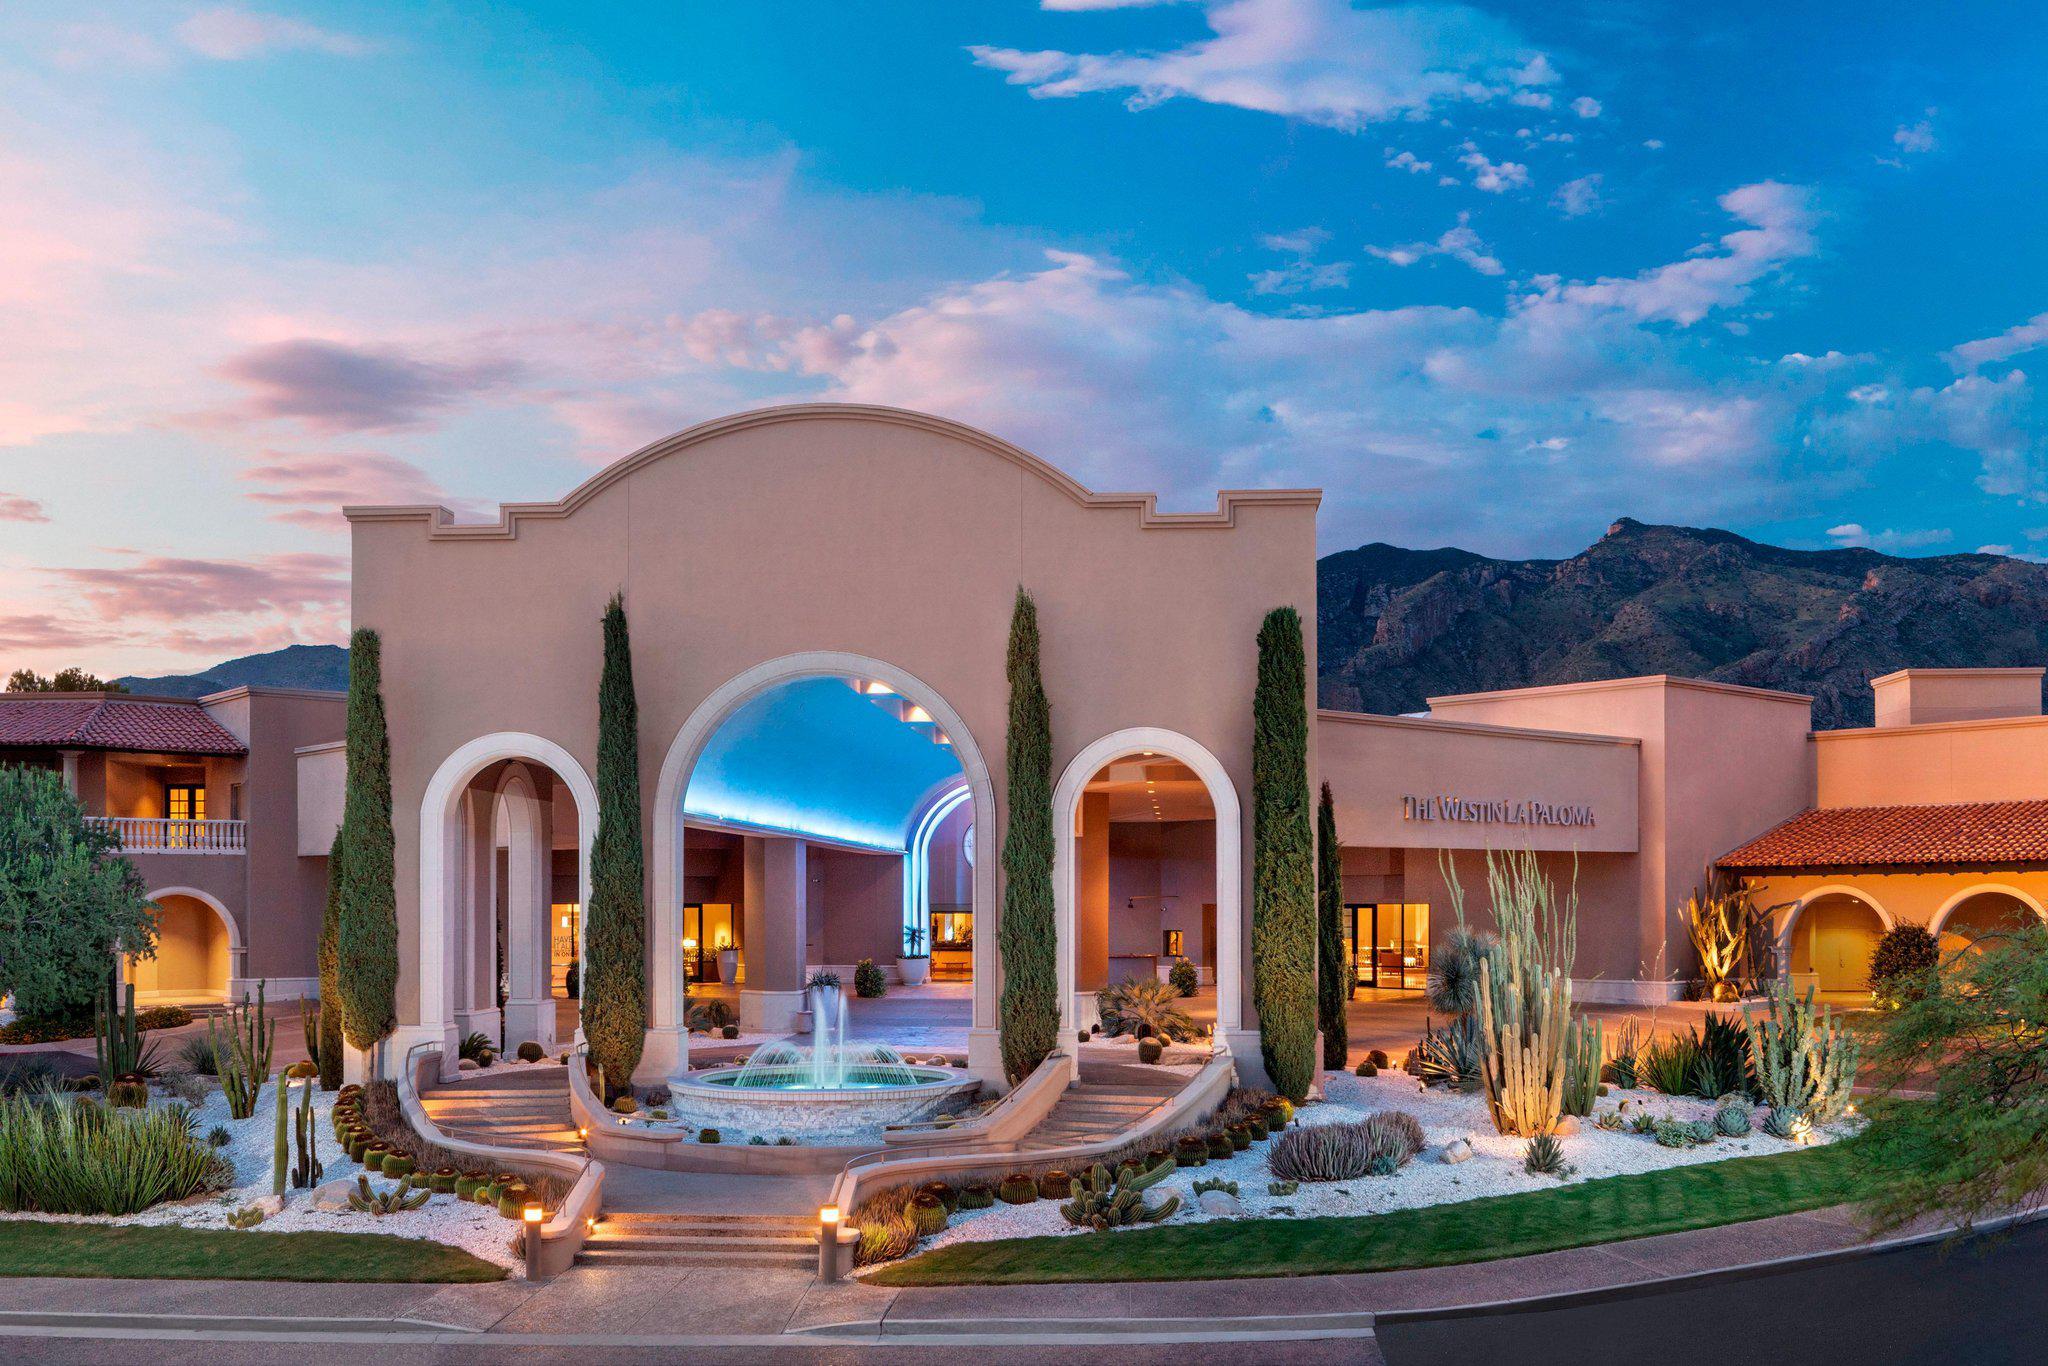 The Westin La Paloma Resort & Spa